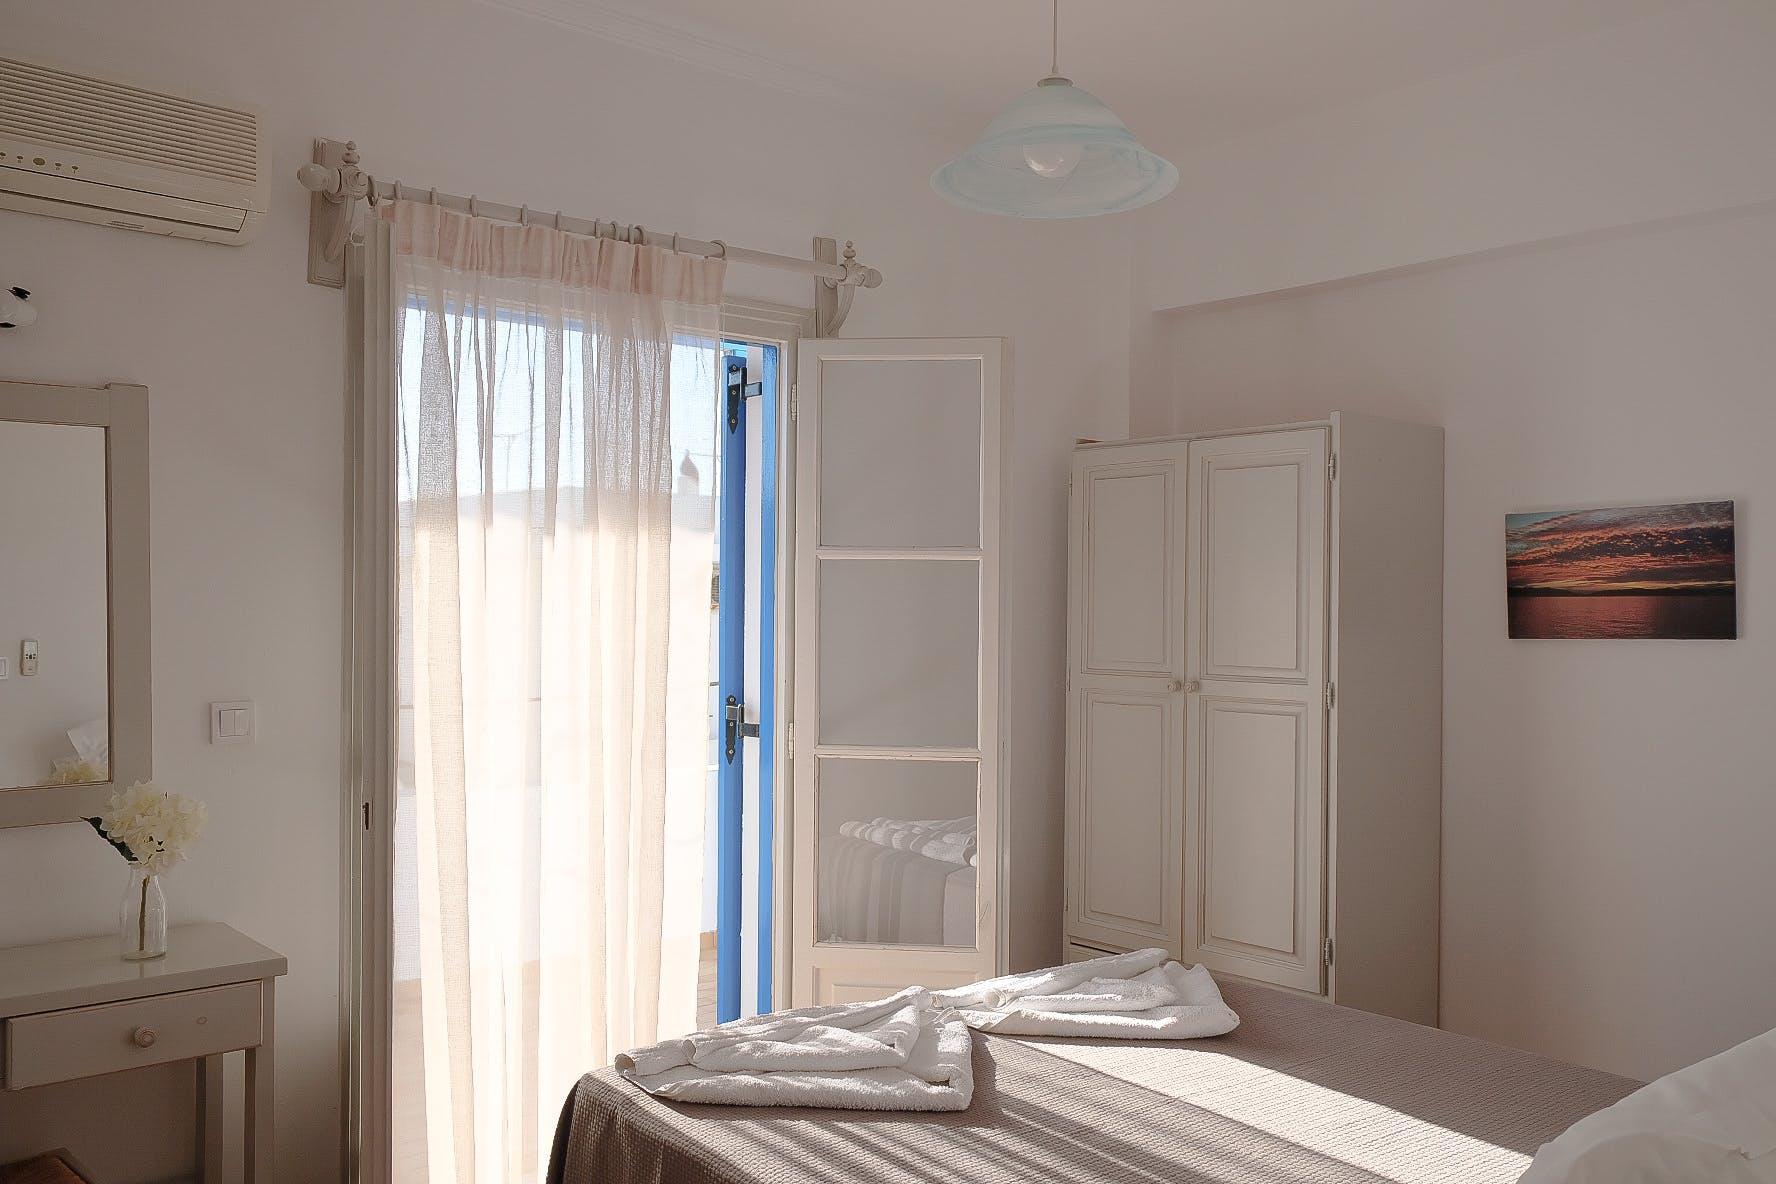 Two Bedroom with terrace bedroom 1